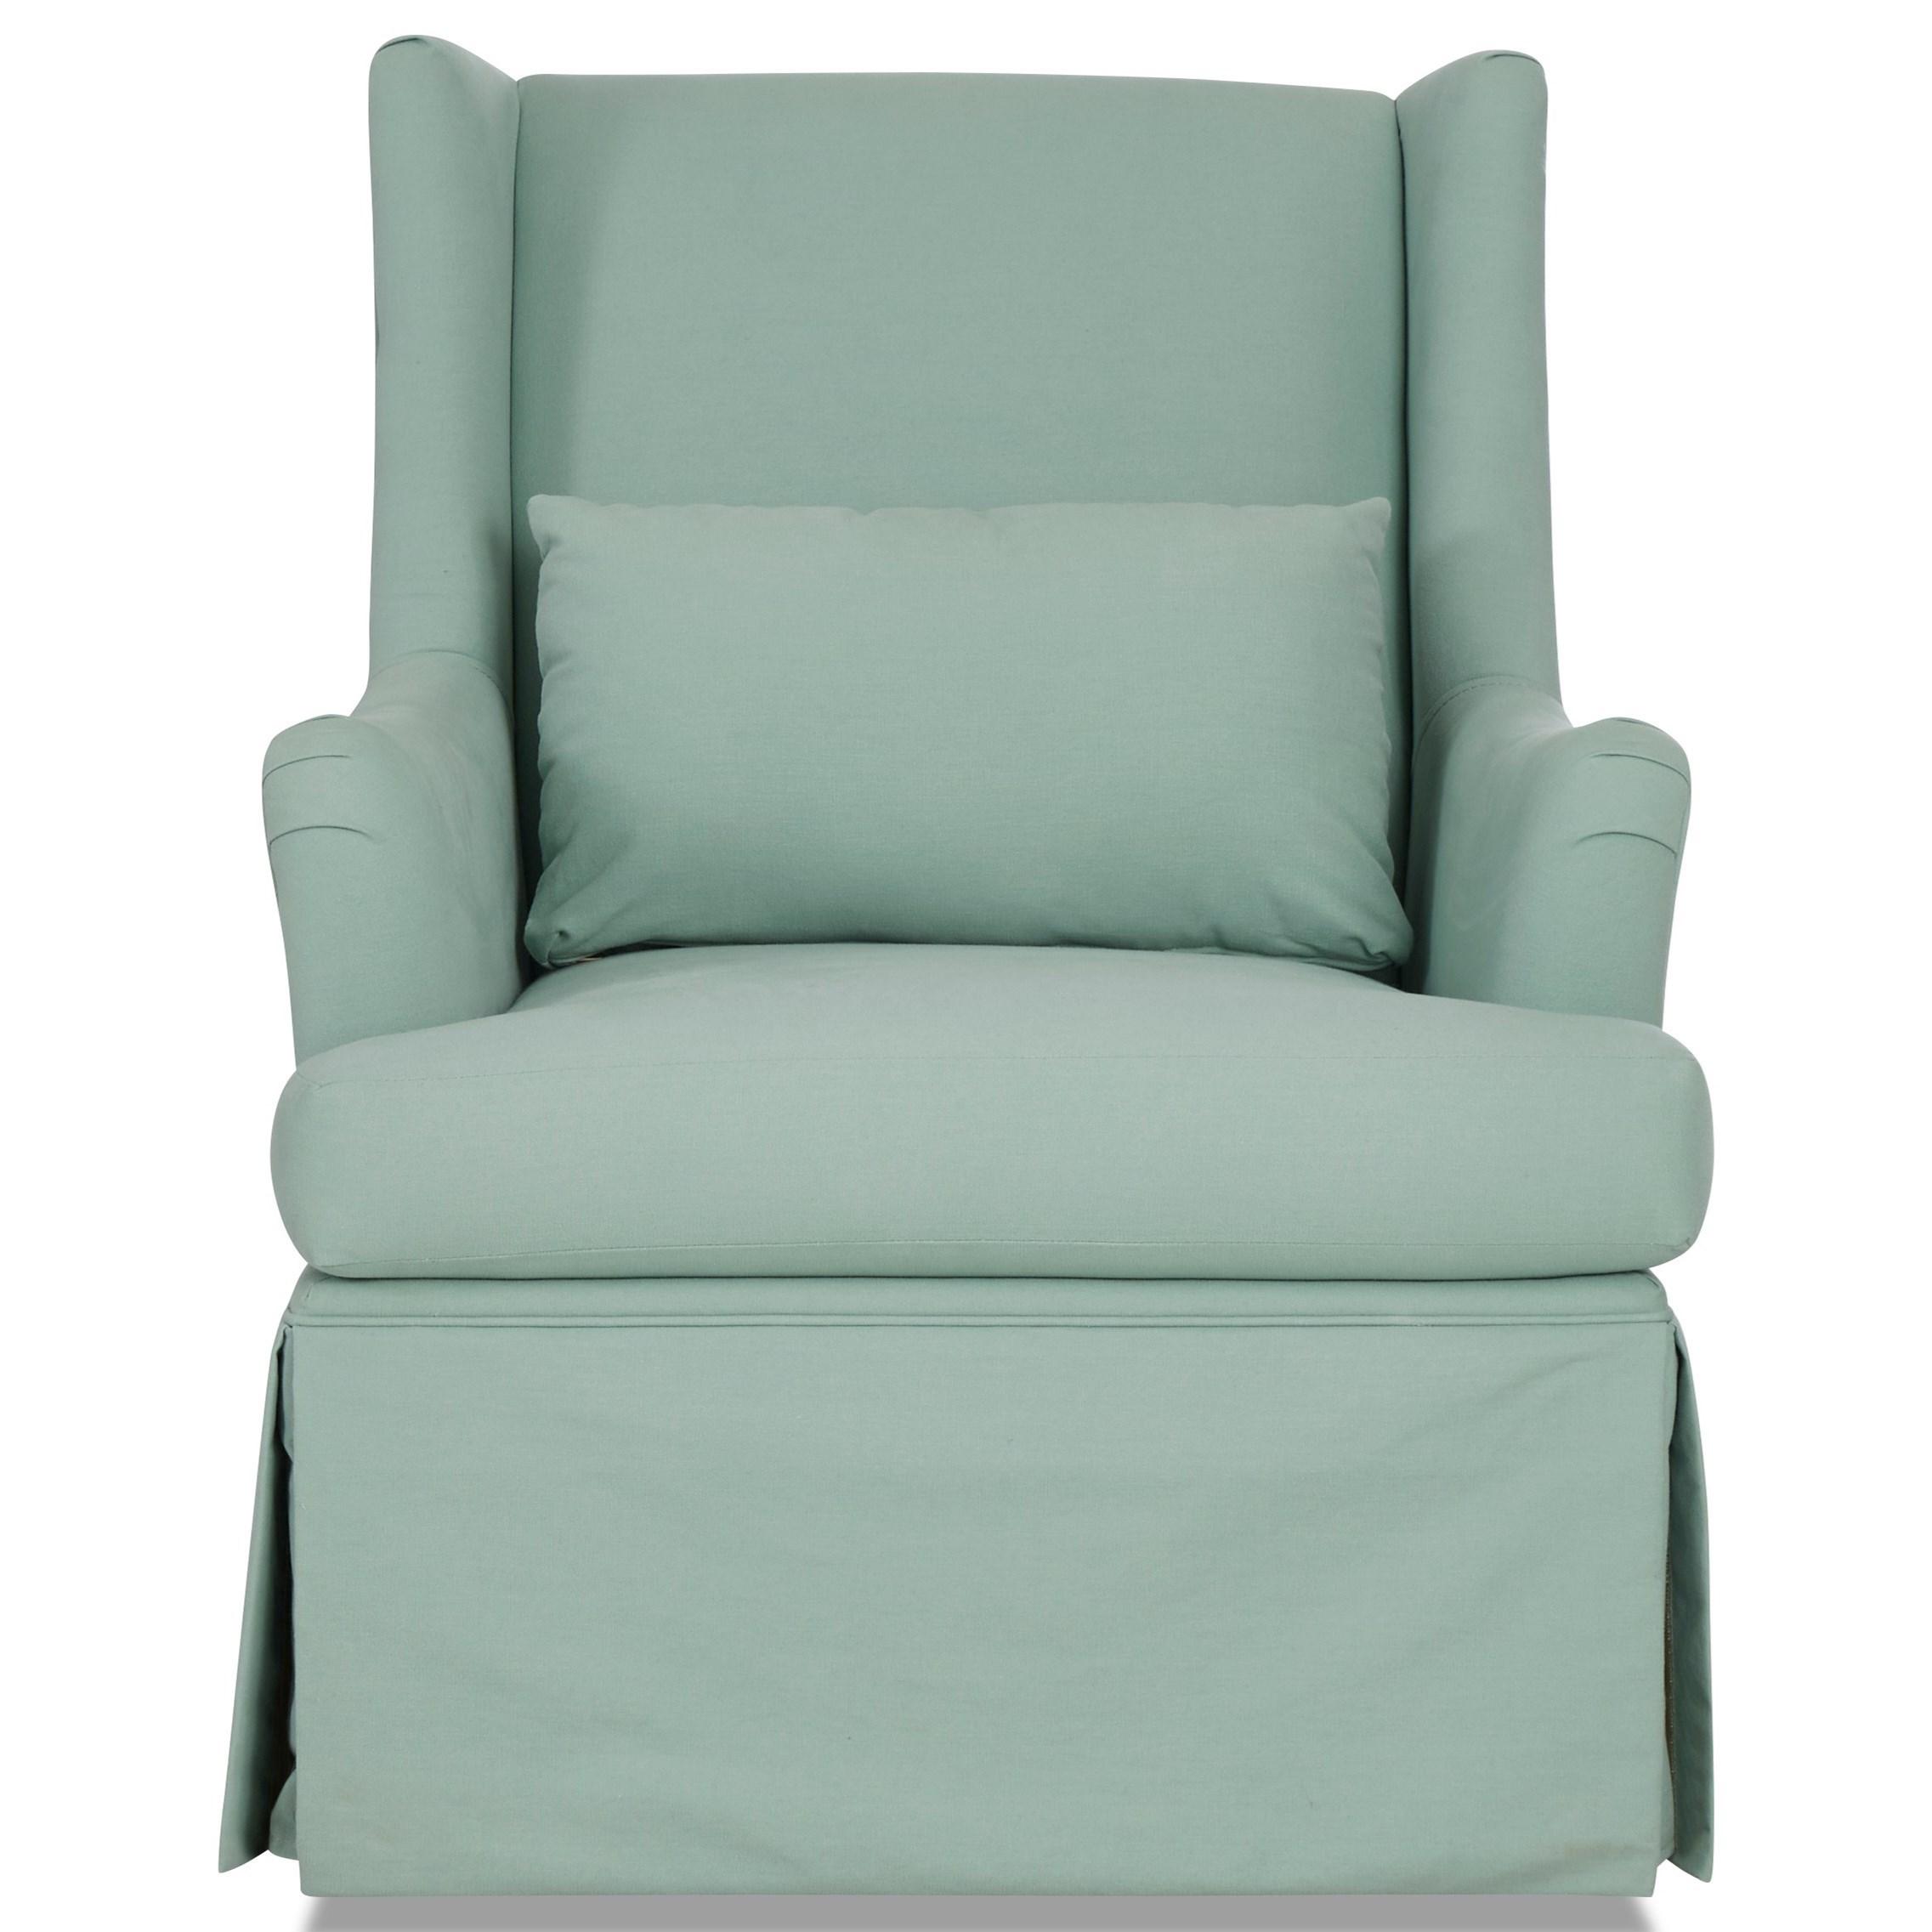 Birdie Swivel Glide Chair by Klaussner at Lapeer Furniture & Mattress Center